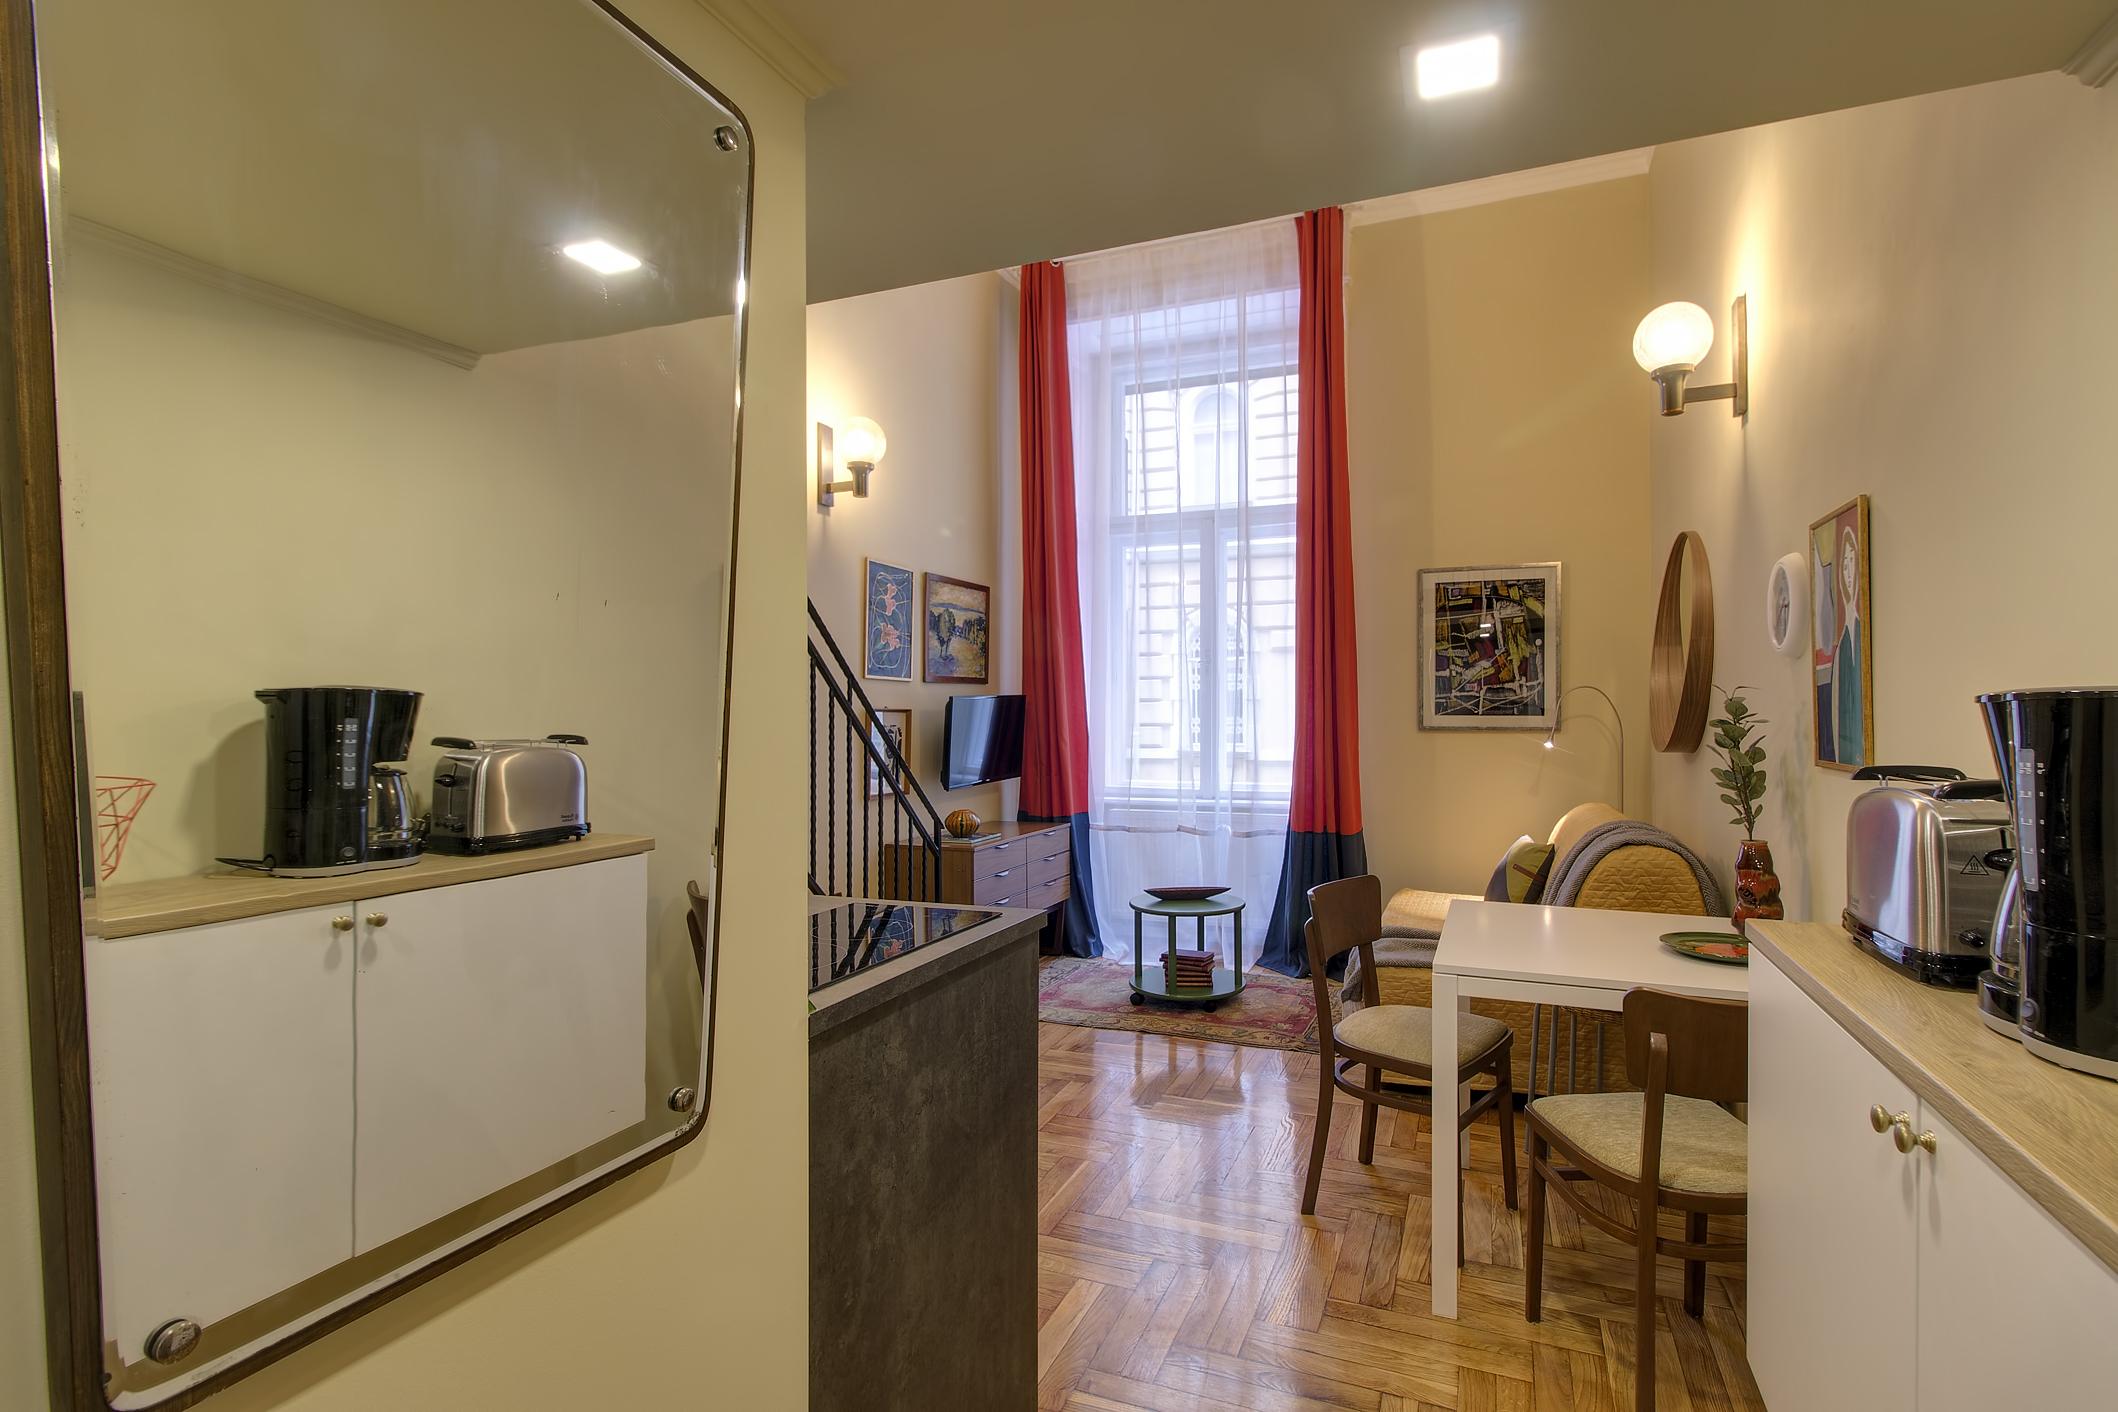 Entrée and living room